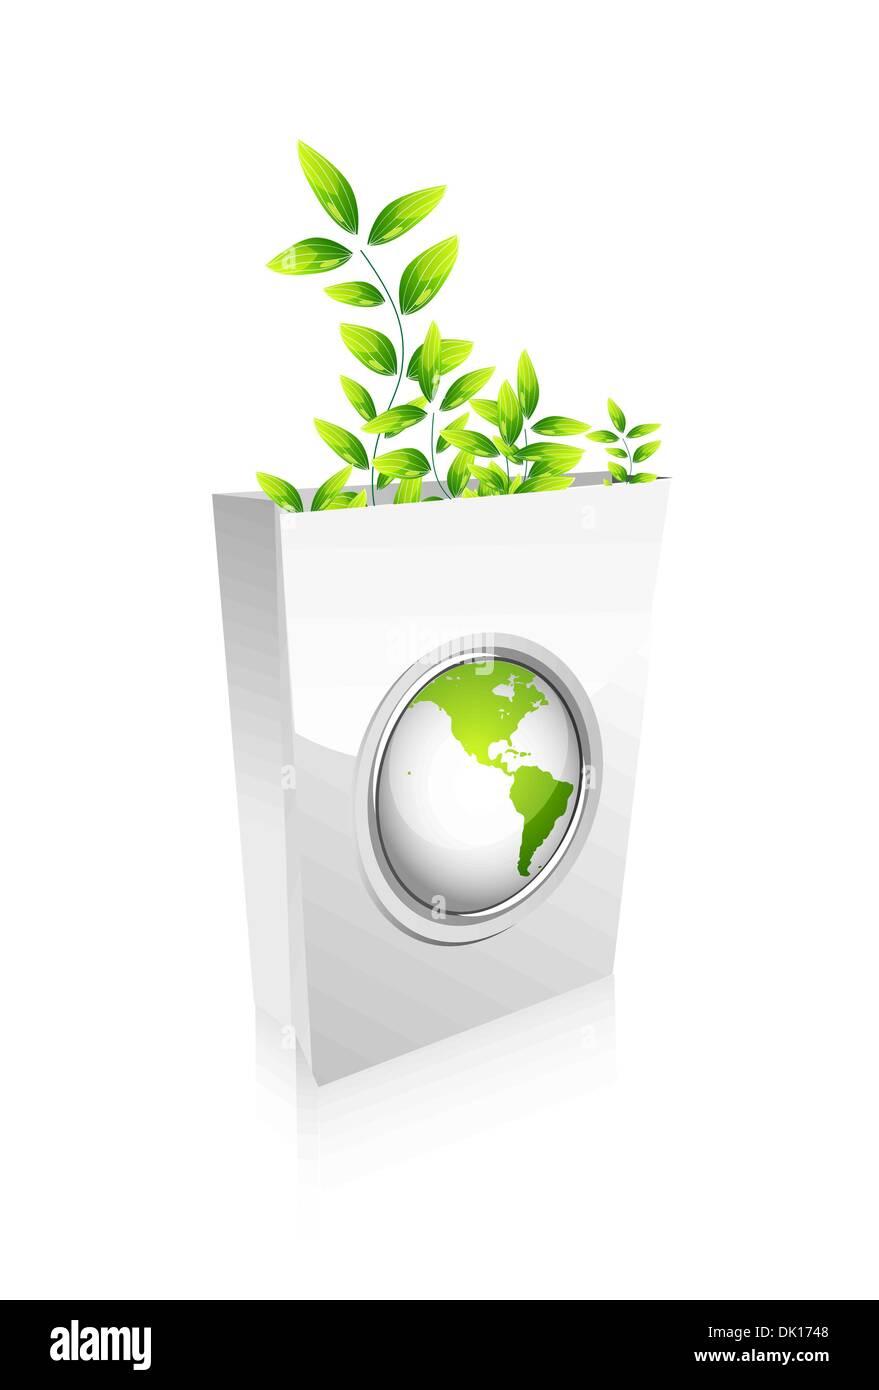 Vector abstract green concept design - Stock Image